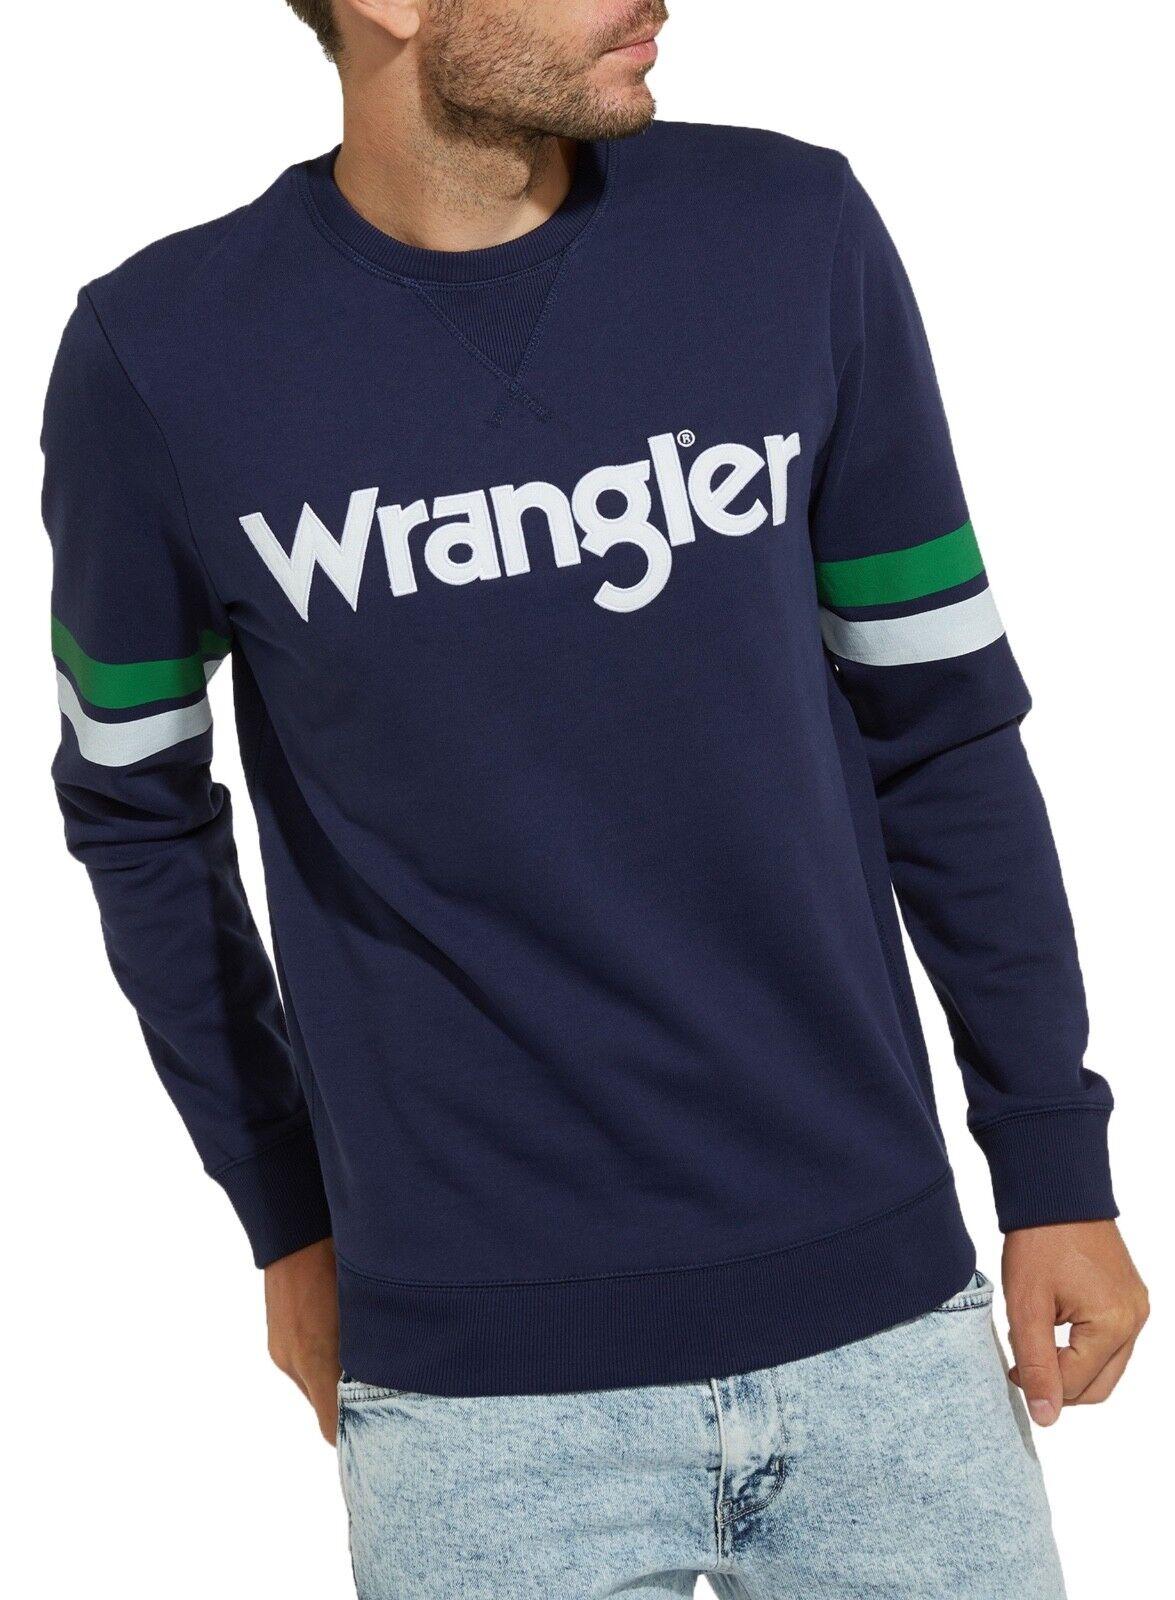 Wrangler Retro Herren Baumwolle Rundhals Großes Logo Sweatshirt Cubanjacke Blau